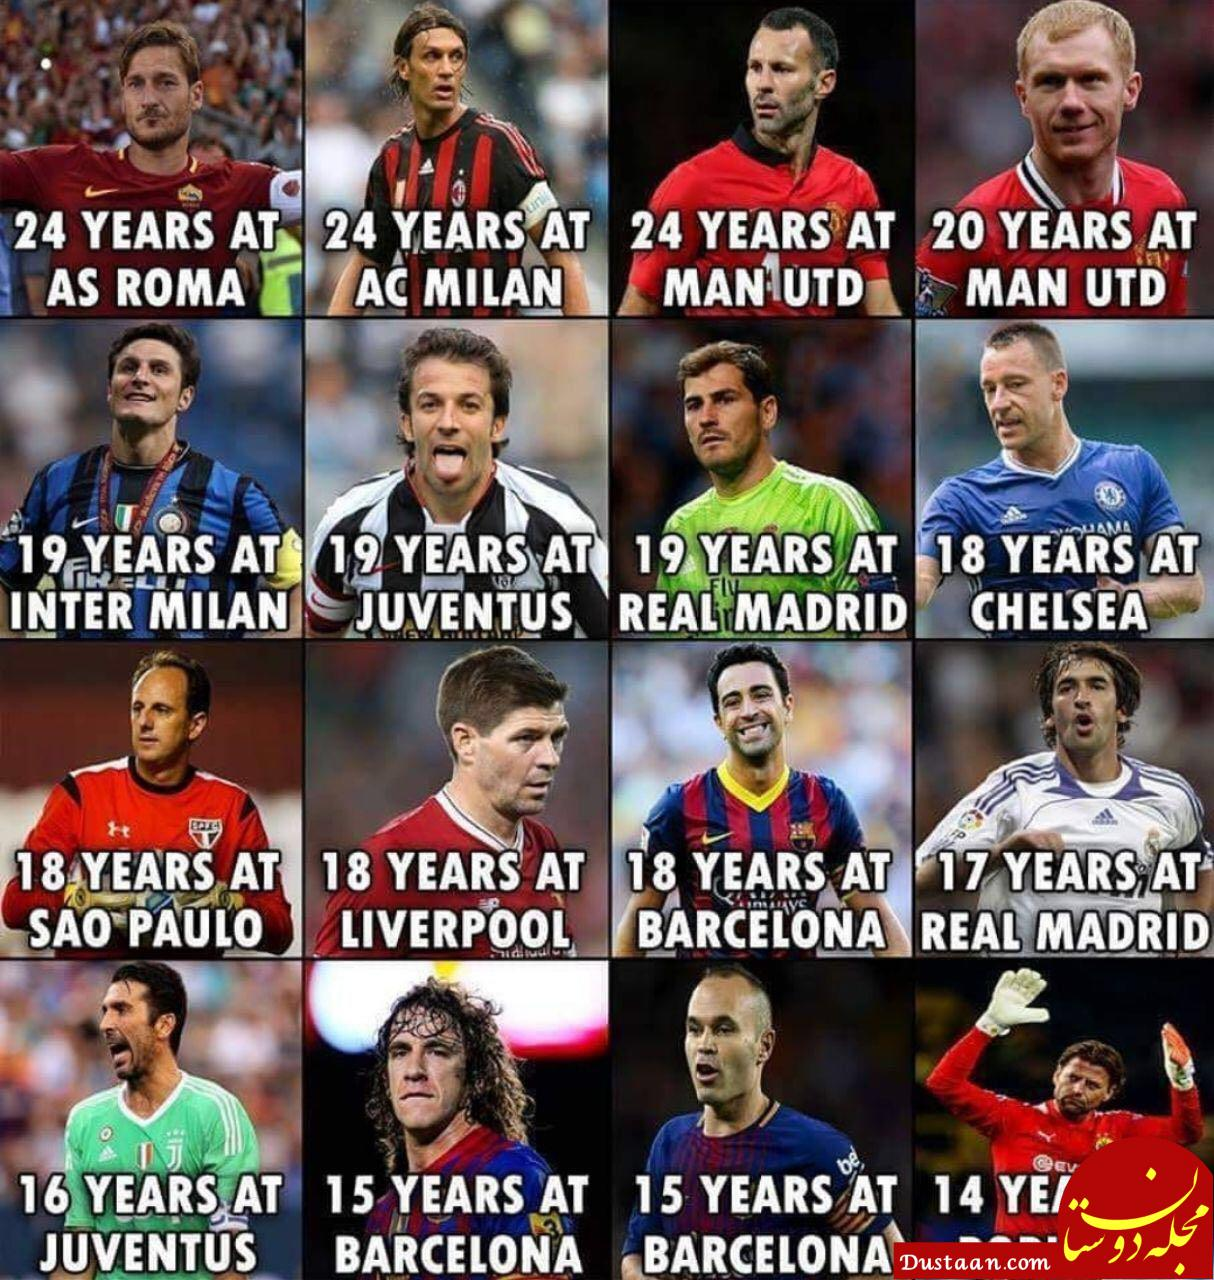 www.dustaan.com وفادارترین بازیکنان فوتبال جهان +عکس